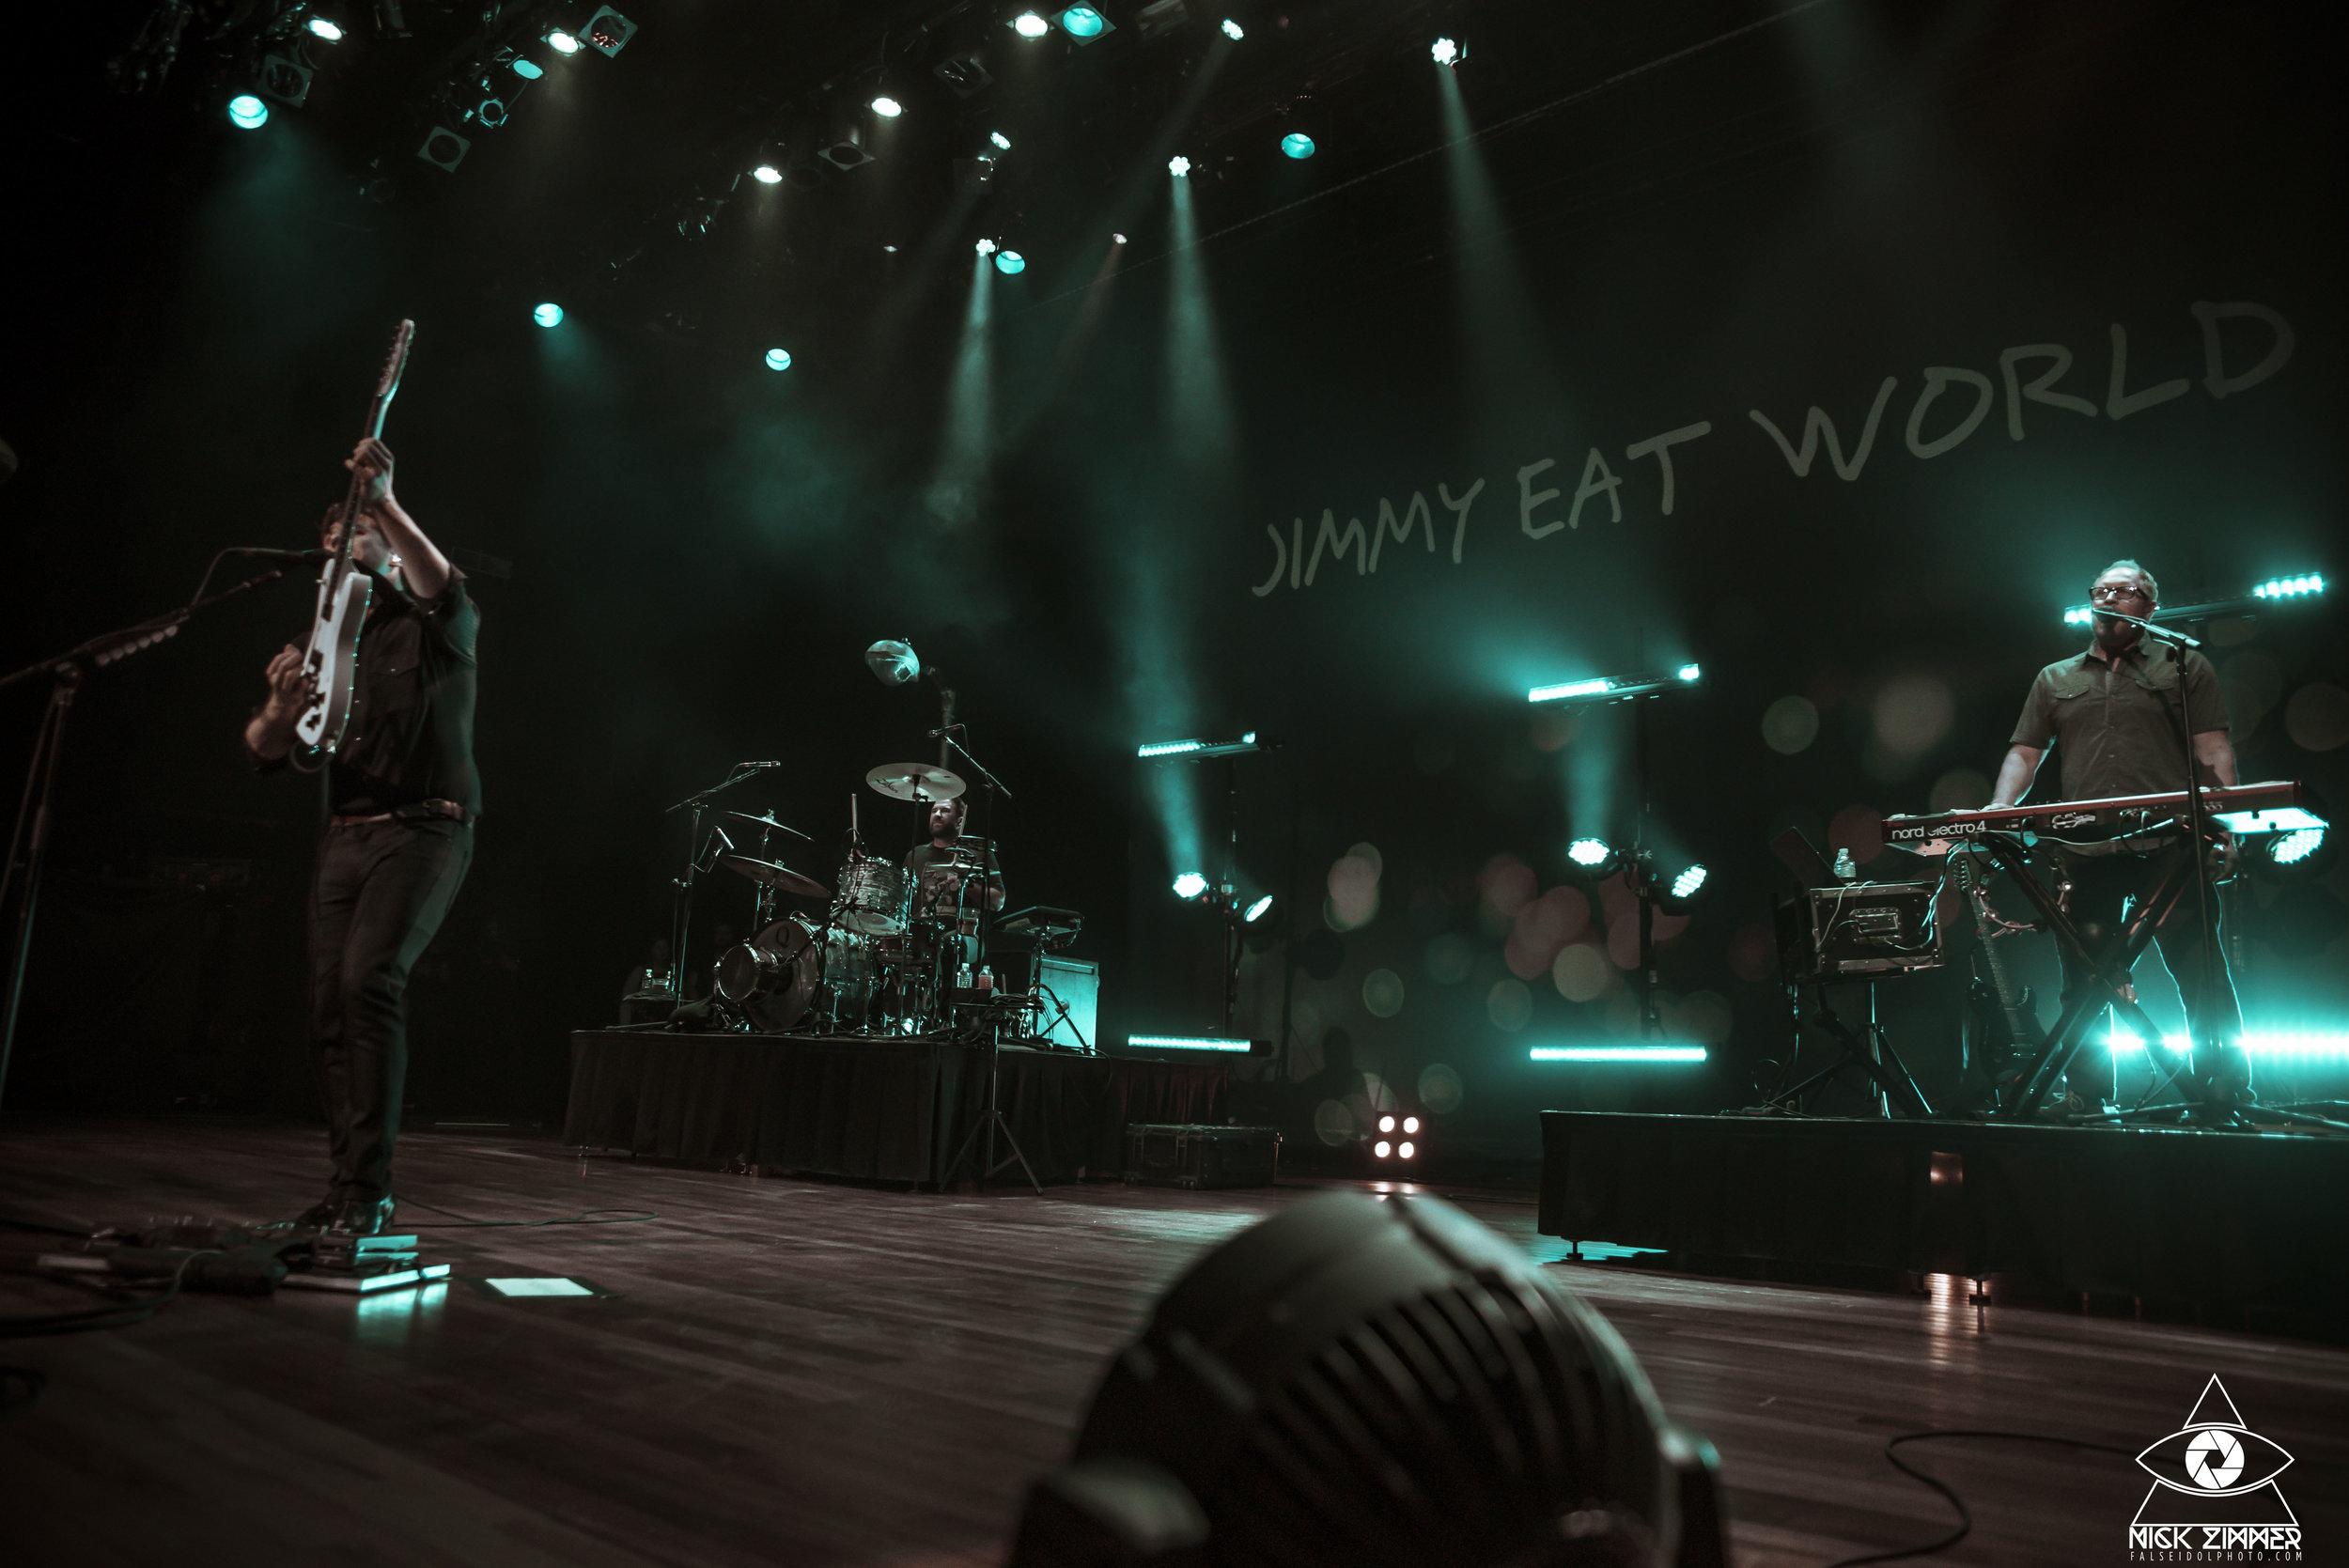 Jimmy Eat World - Venue: The Ryman AuditoriumCity: Nashville, TNDate: May 12, 2018